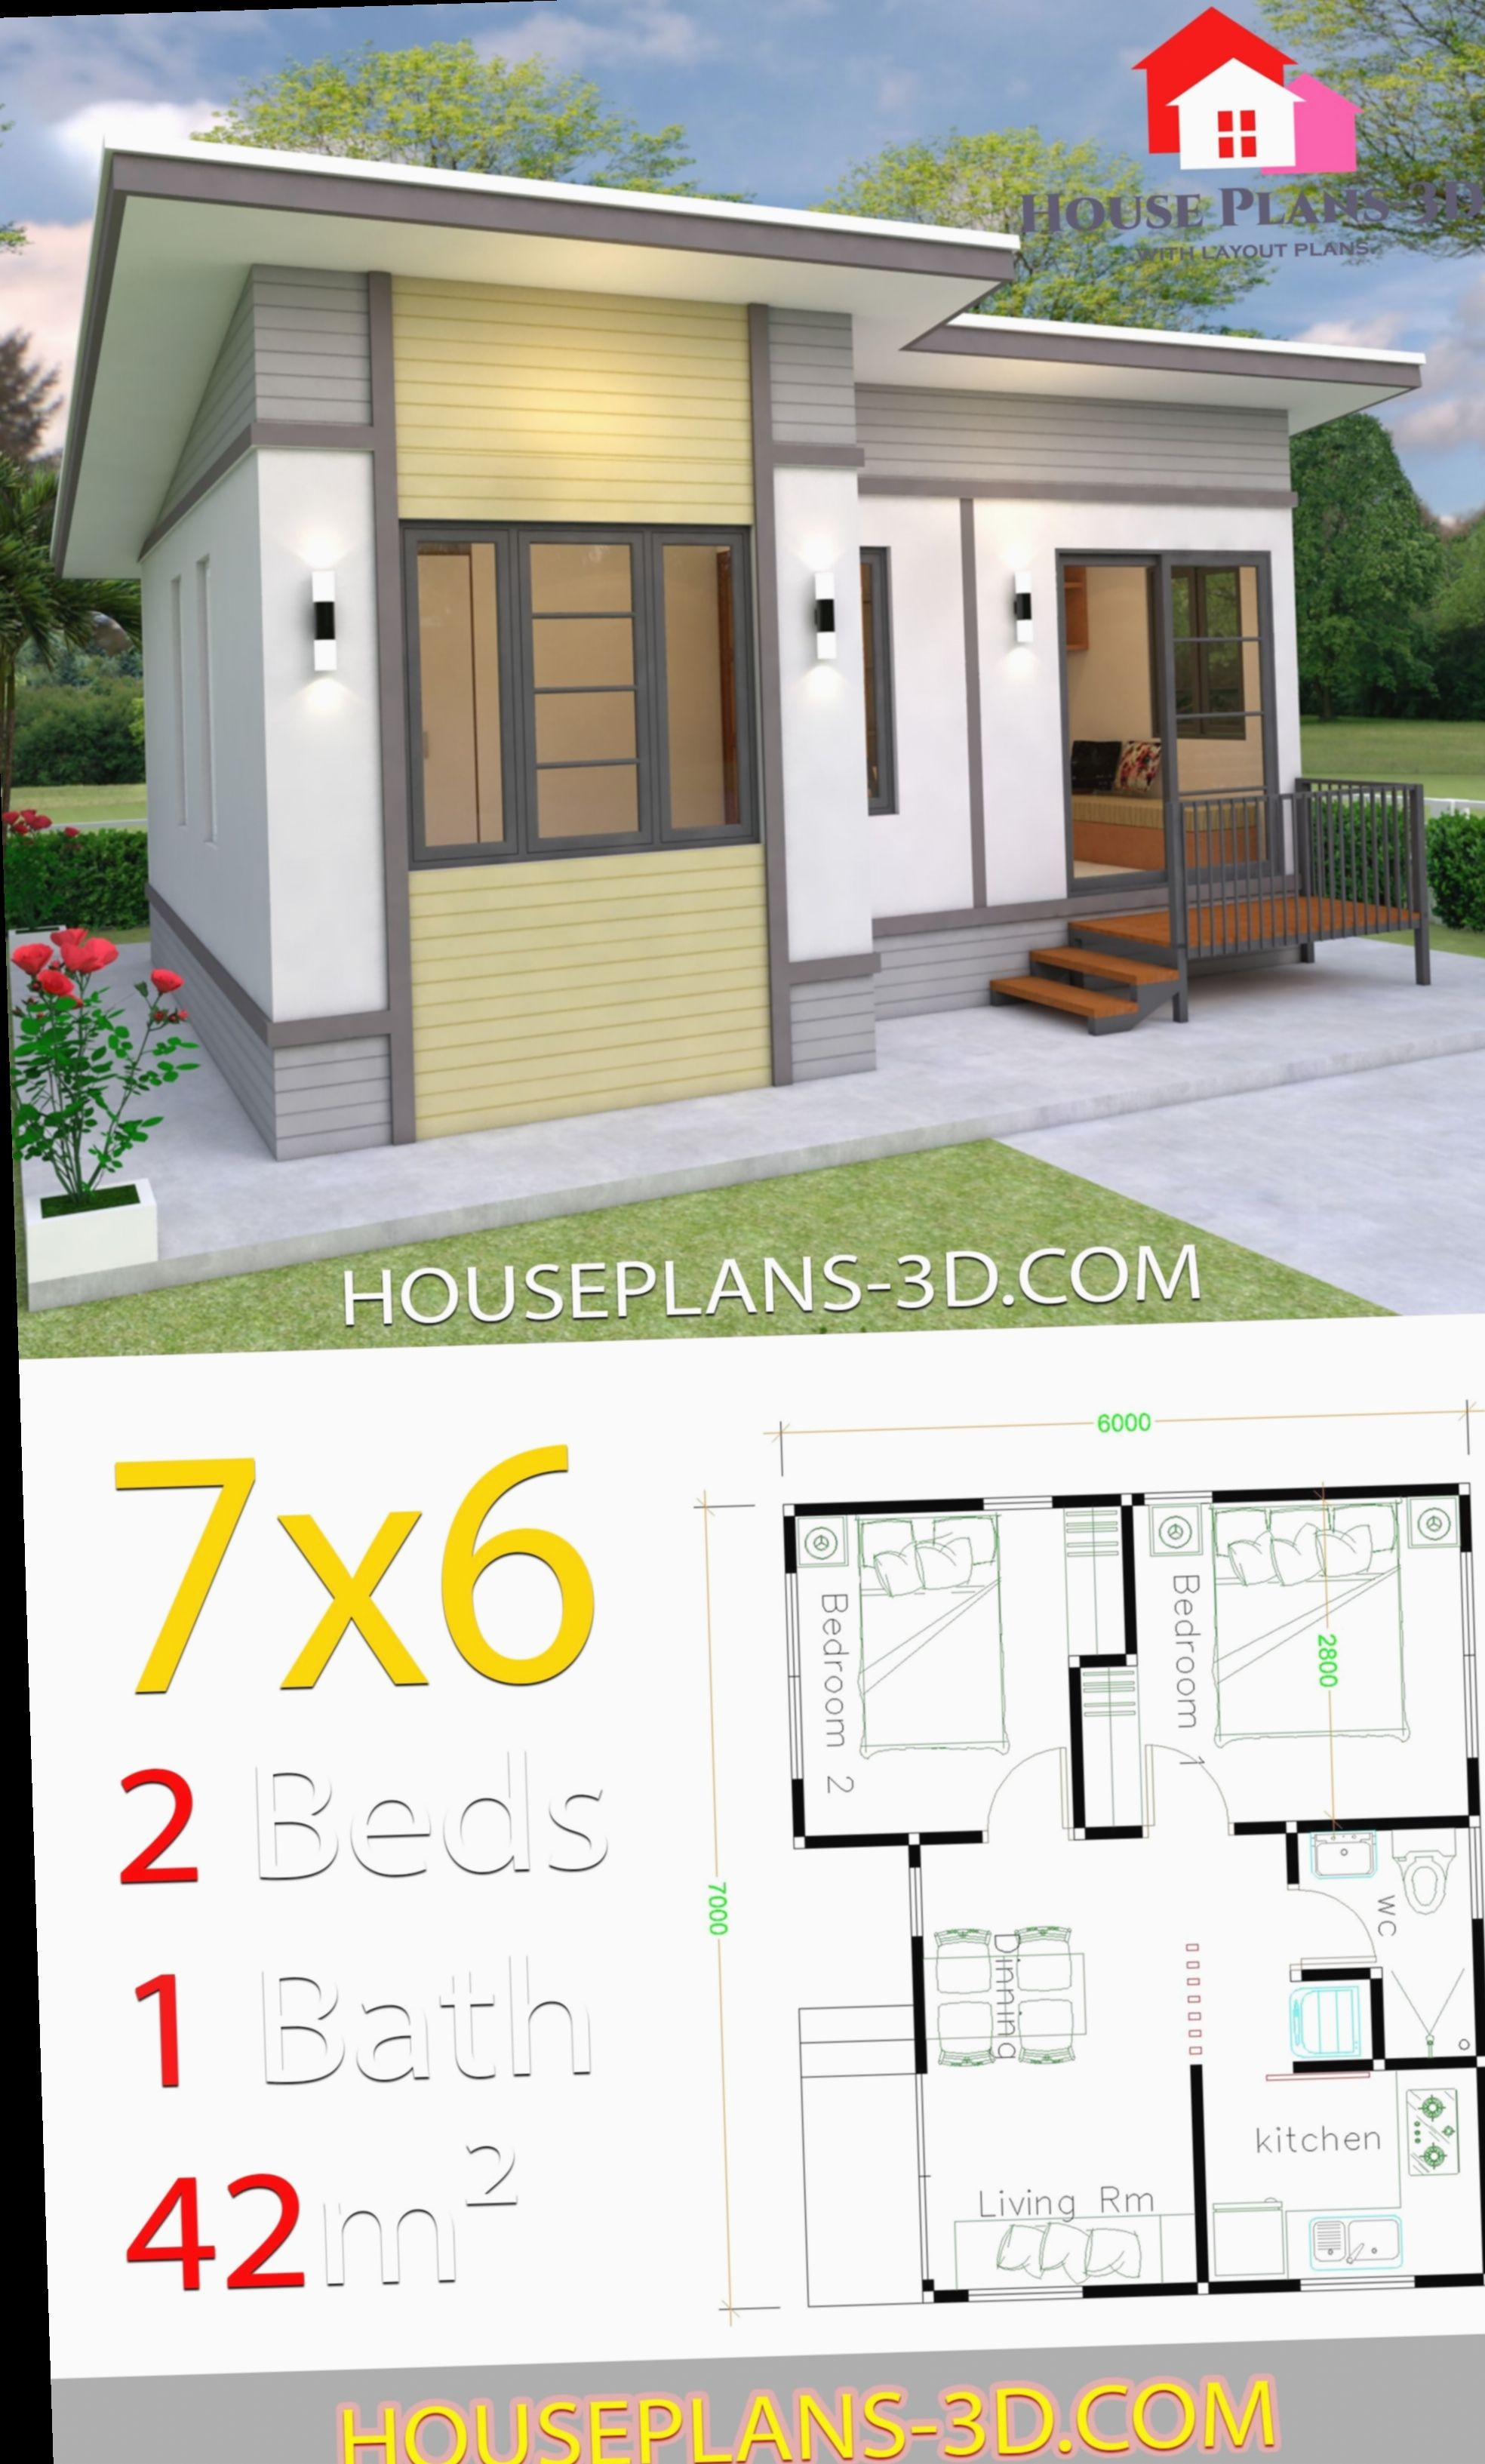 Diy House Plans Layout Nature Cabintinyhousebuilder Minimalist Diy House Plans House Plans Small House Design